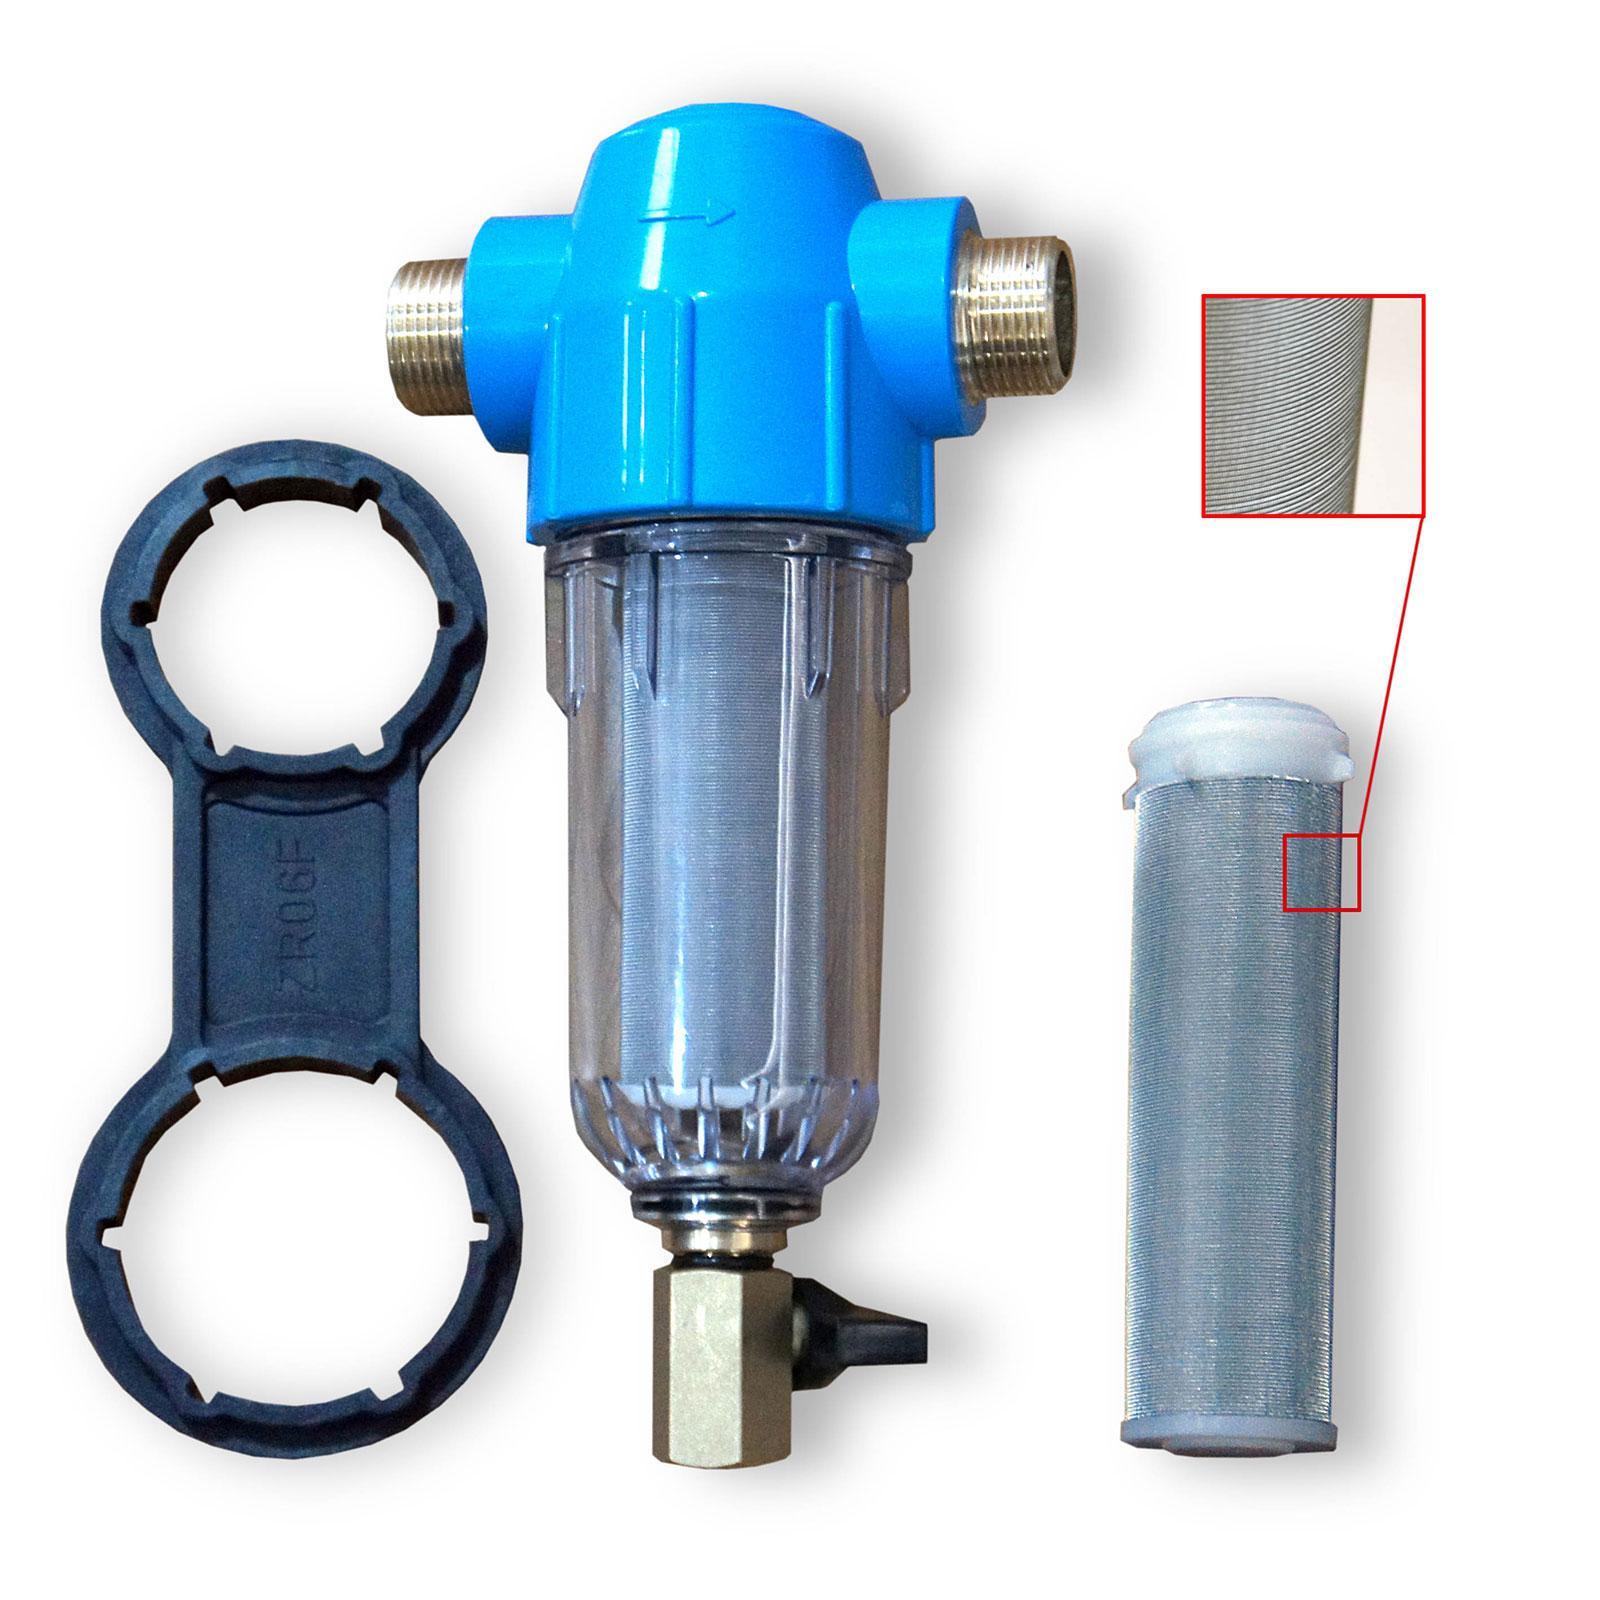 Hauswasserfilter Rückspülfilter, Sandfilter/Sedimentfilter